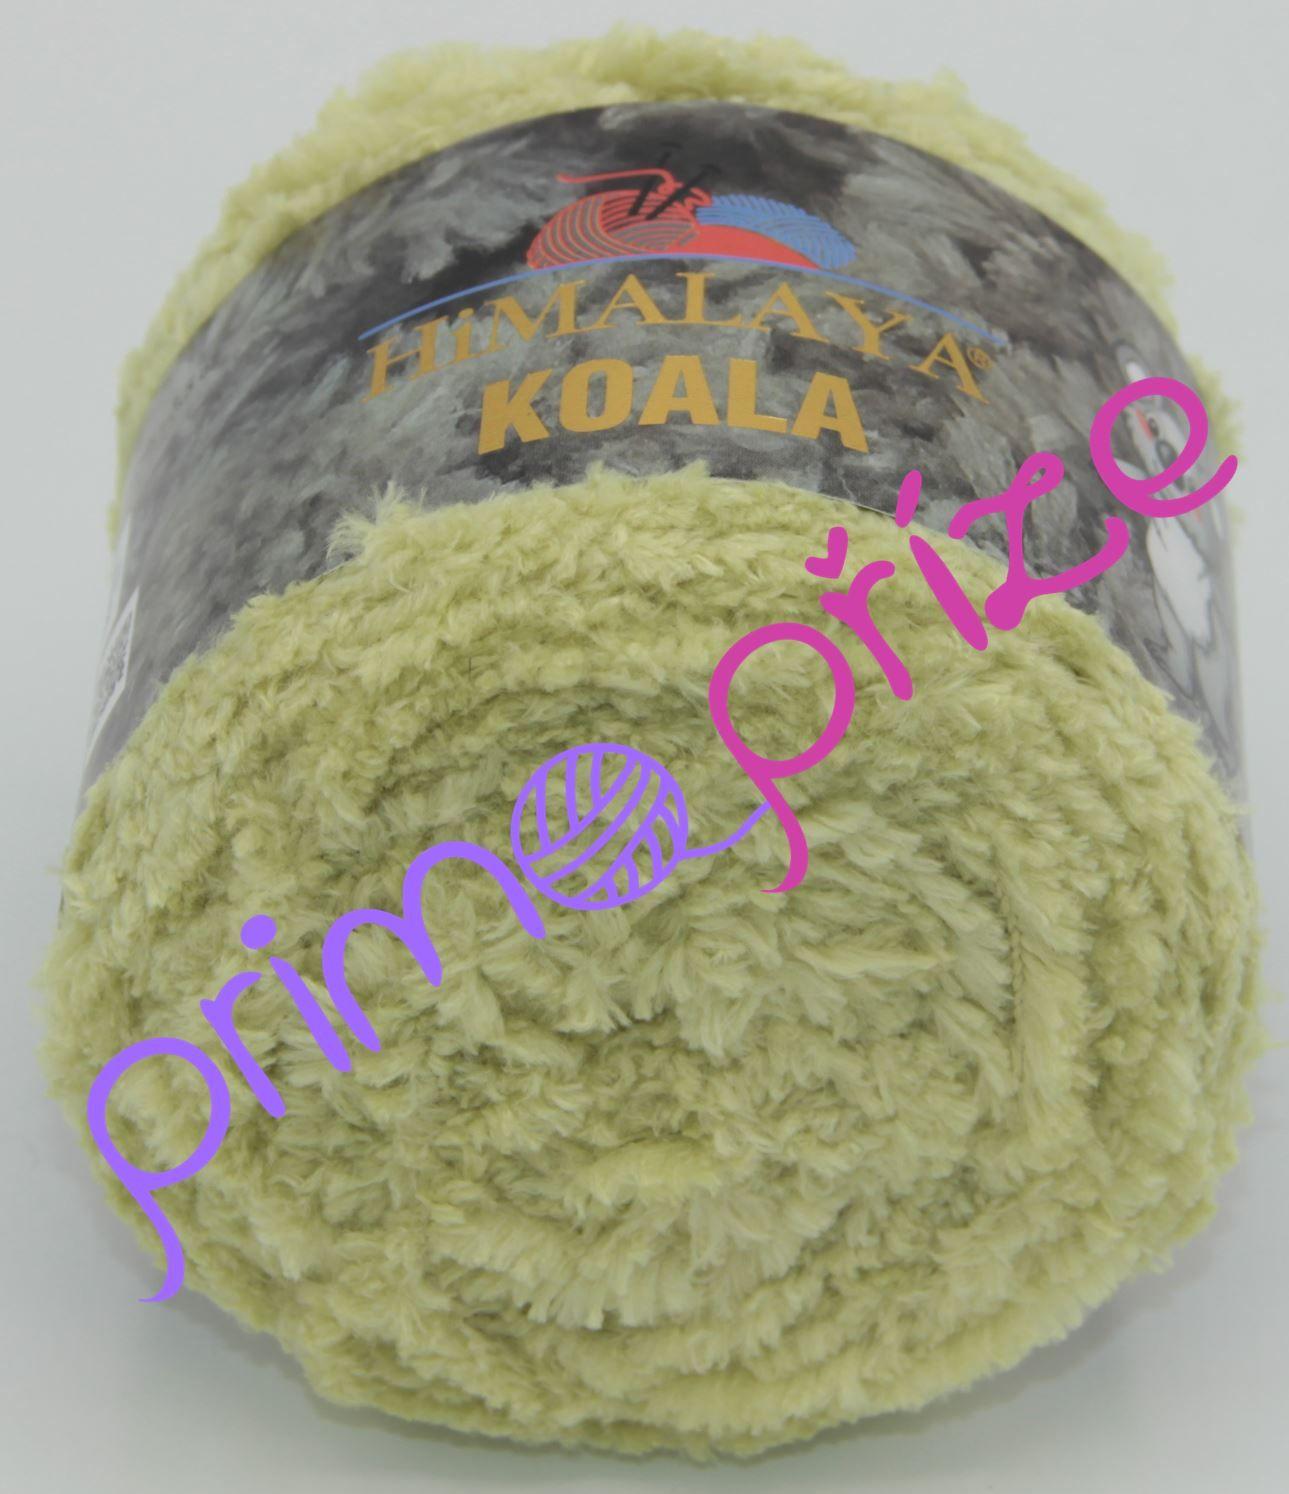 HIMALAYA Koala 75722 zelenkavá